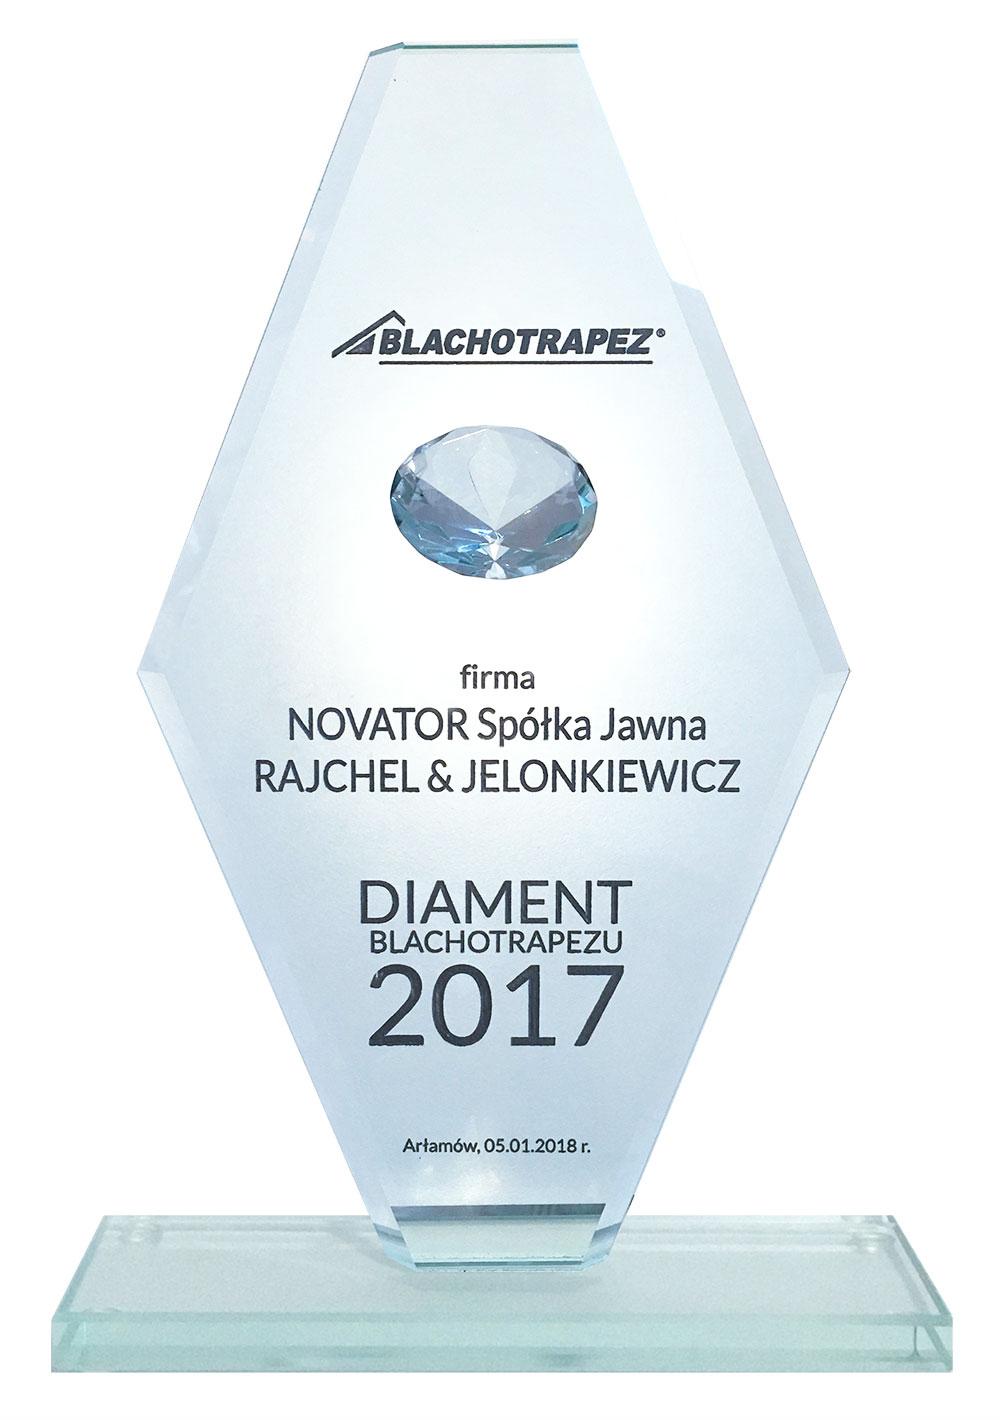 Diament Blachotrapezu 2017